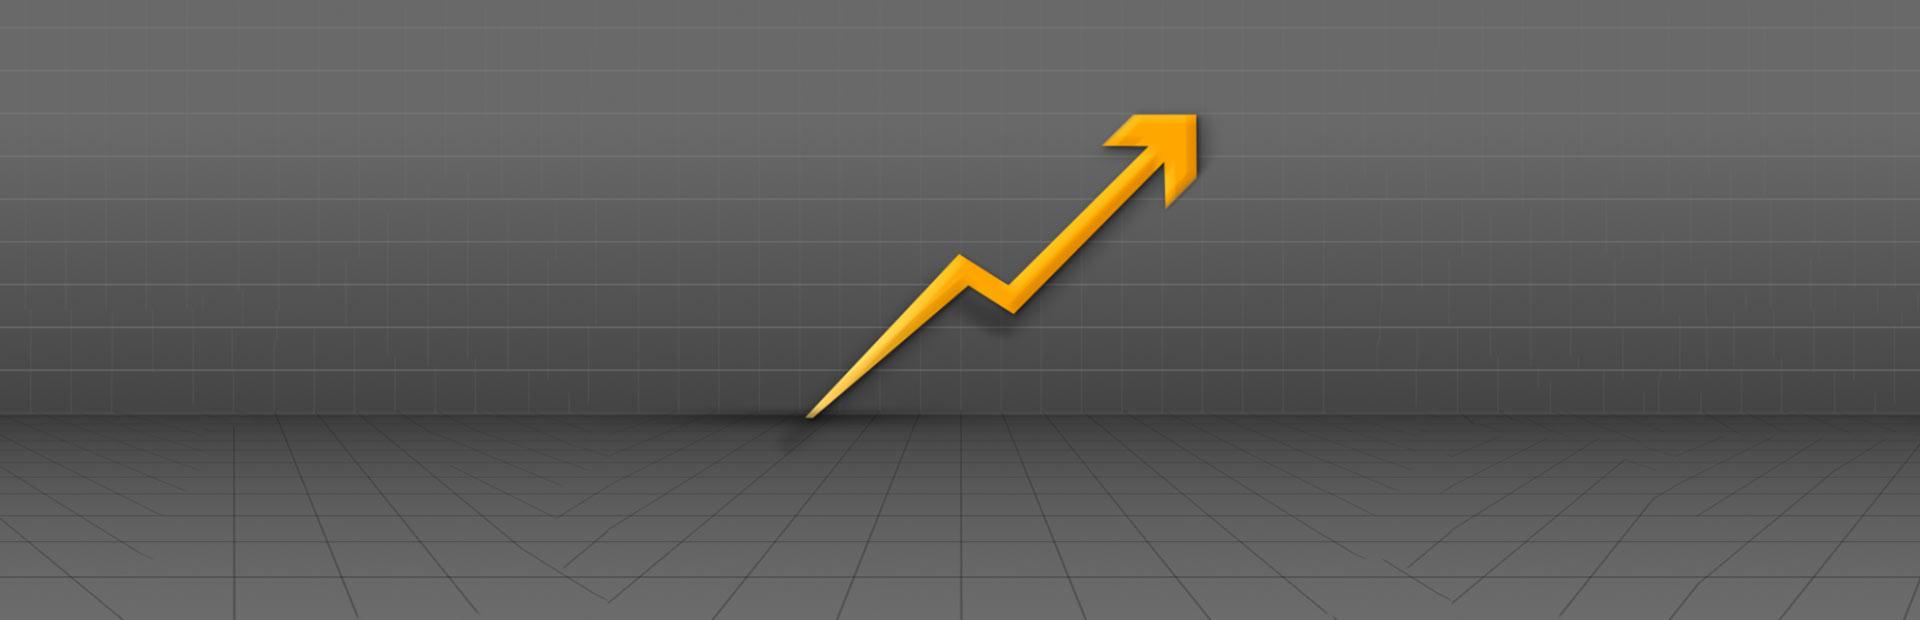 Fixed Deposit Rates Sri Lanka Current Interest Rates In Sri Lanka